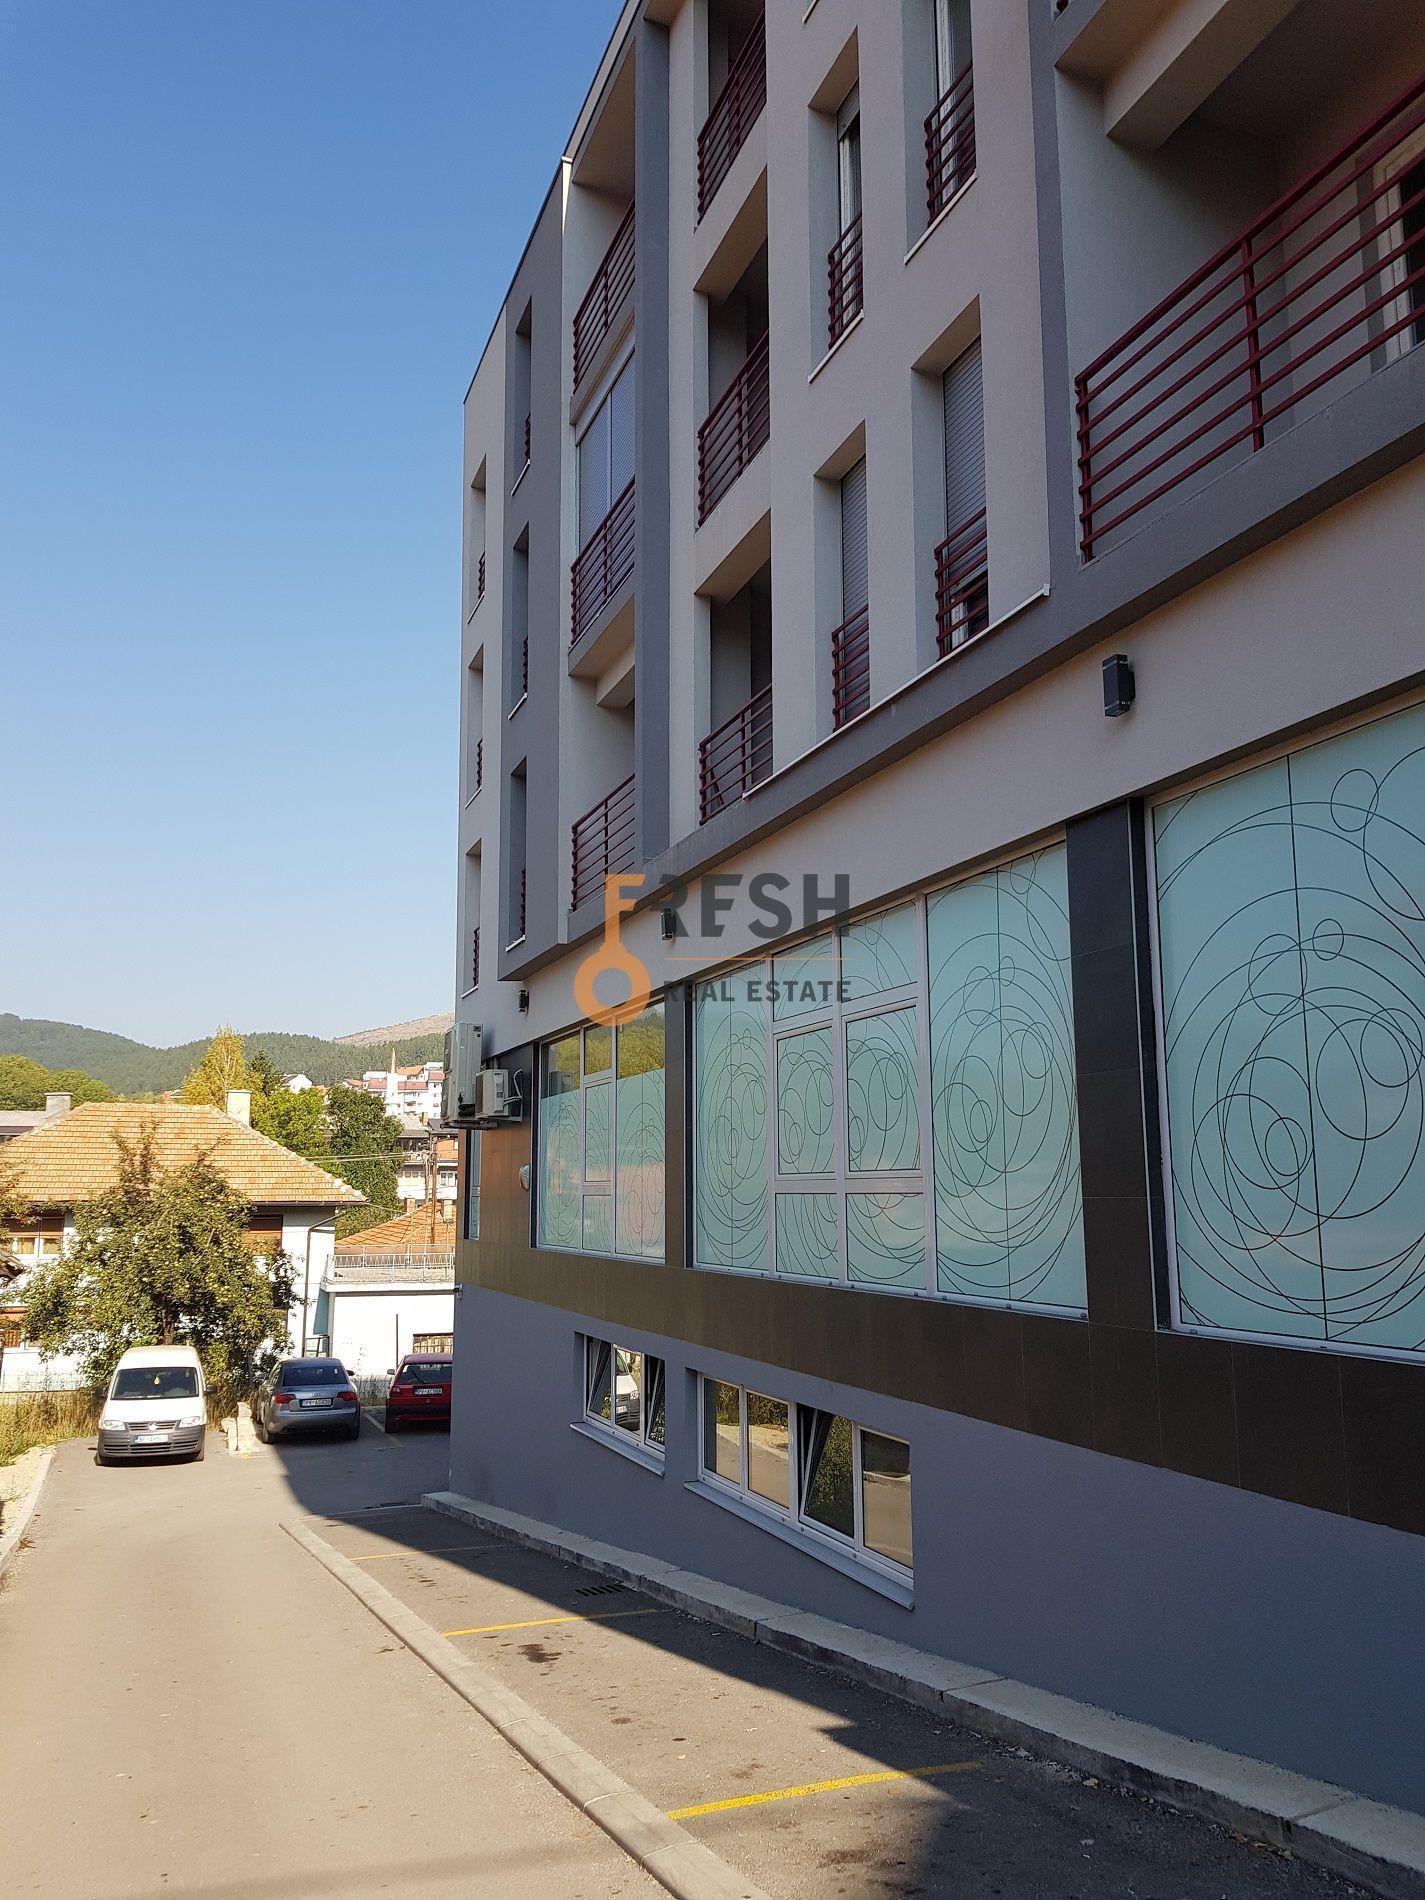 Jednosoban stan 45 m2, Centar, Pljevlja, Prodaja - 1